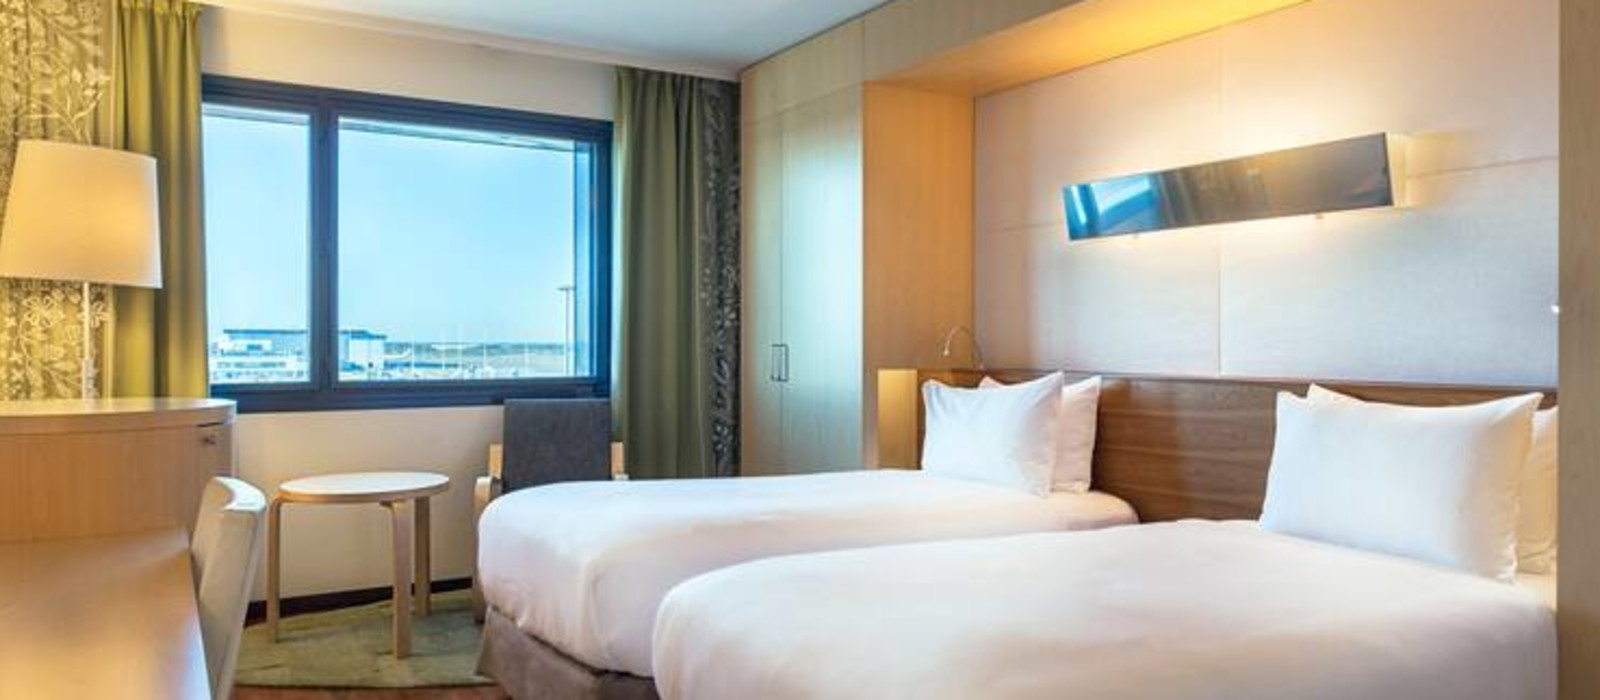 Hotel Hilton Helsinki Airport Arktis